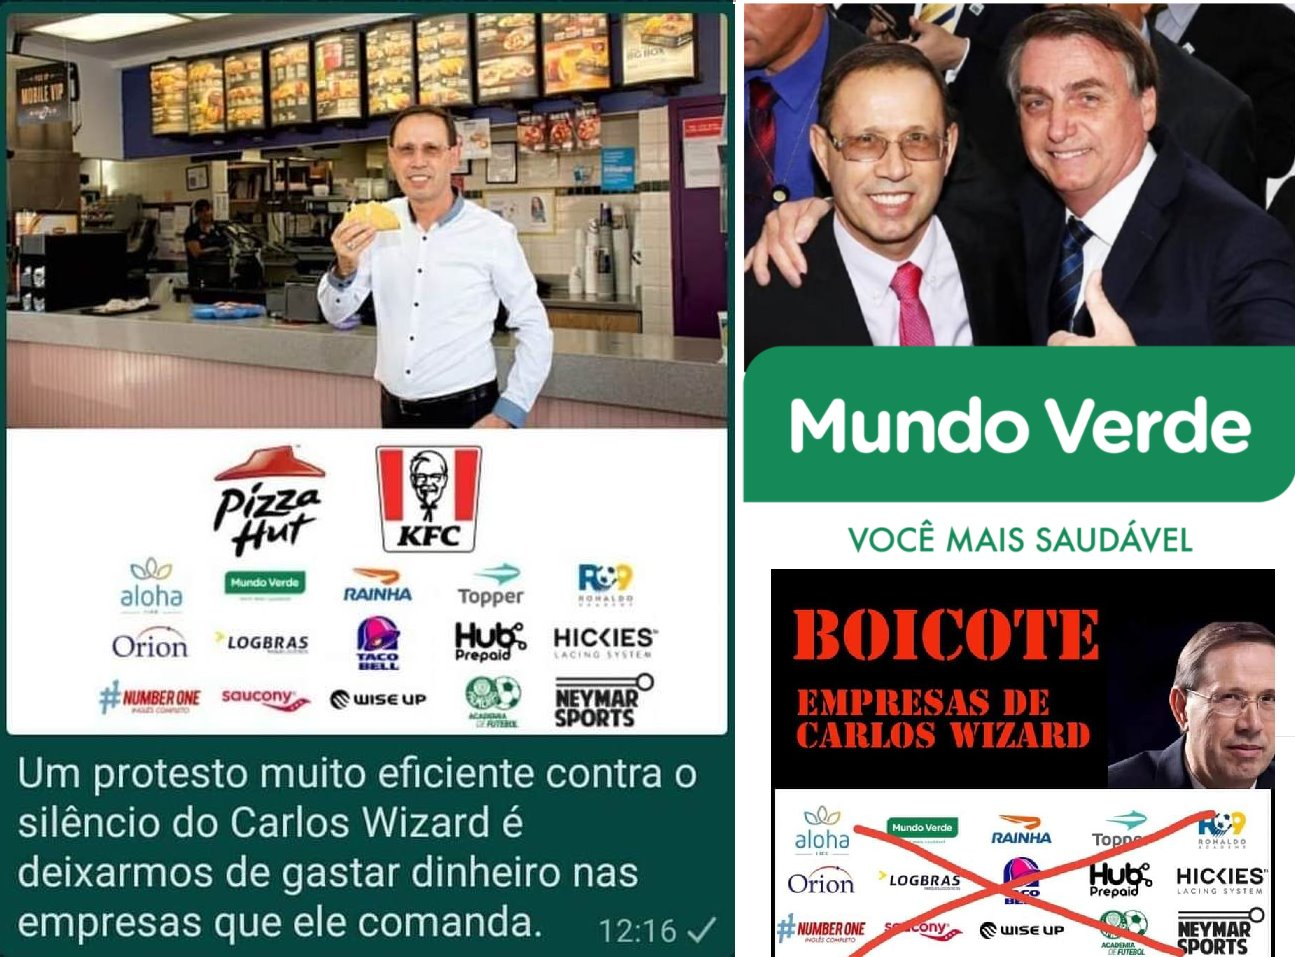 Posts de redes sociais pedindo boicote às empresas de Carlos Wizard